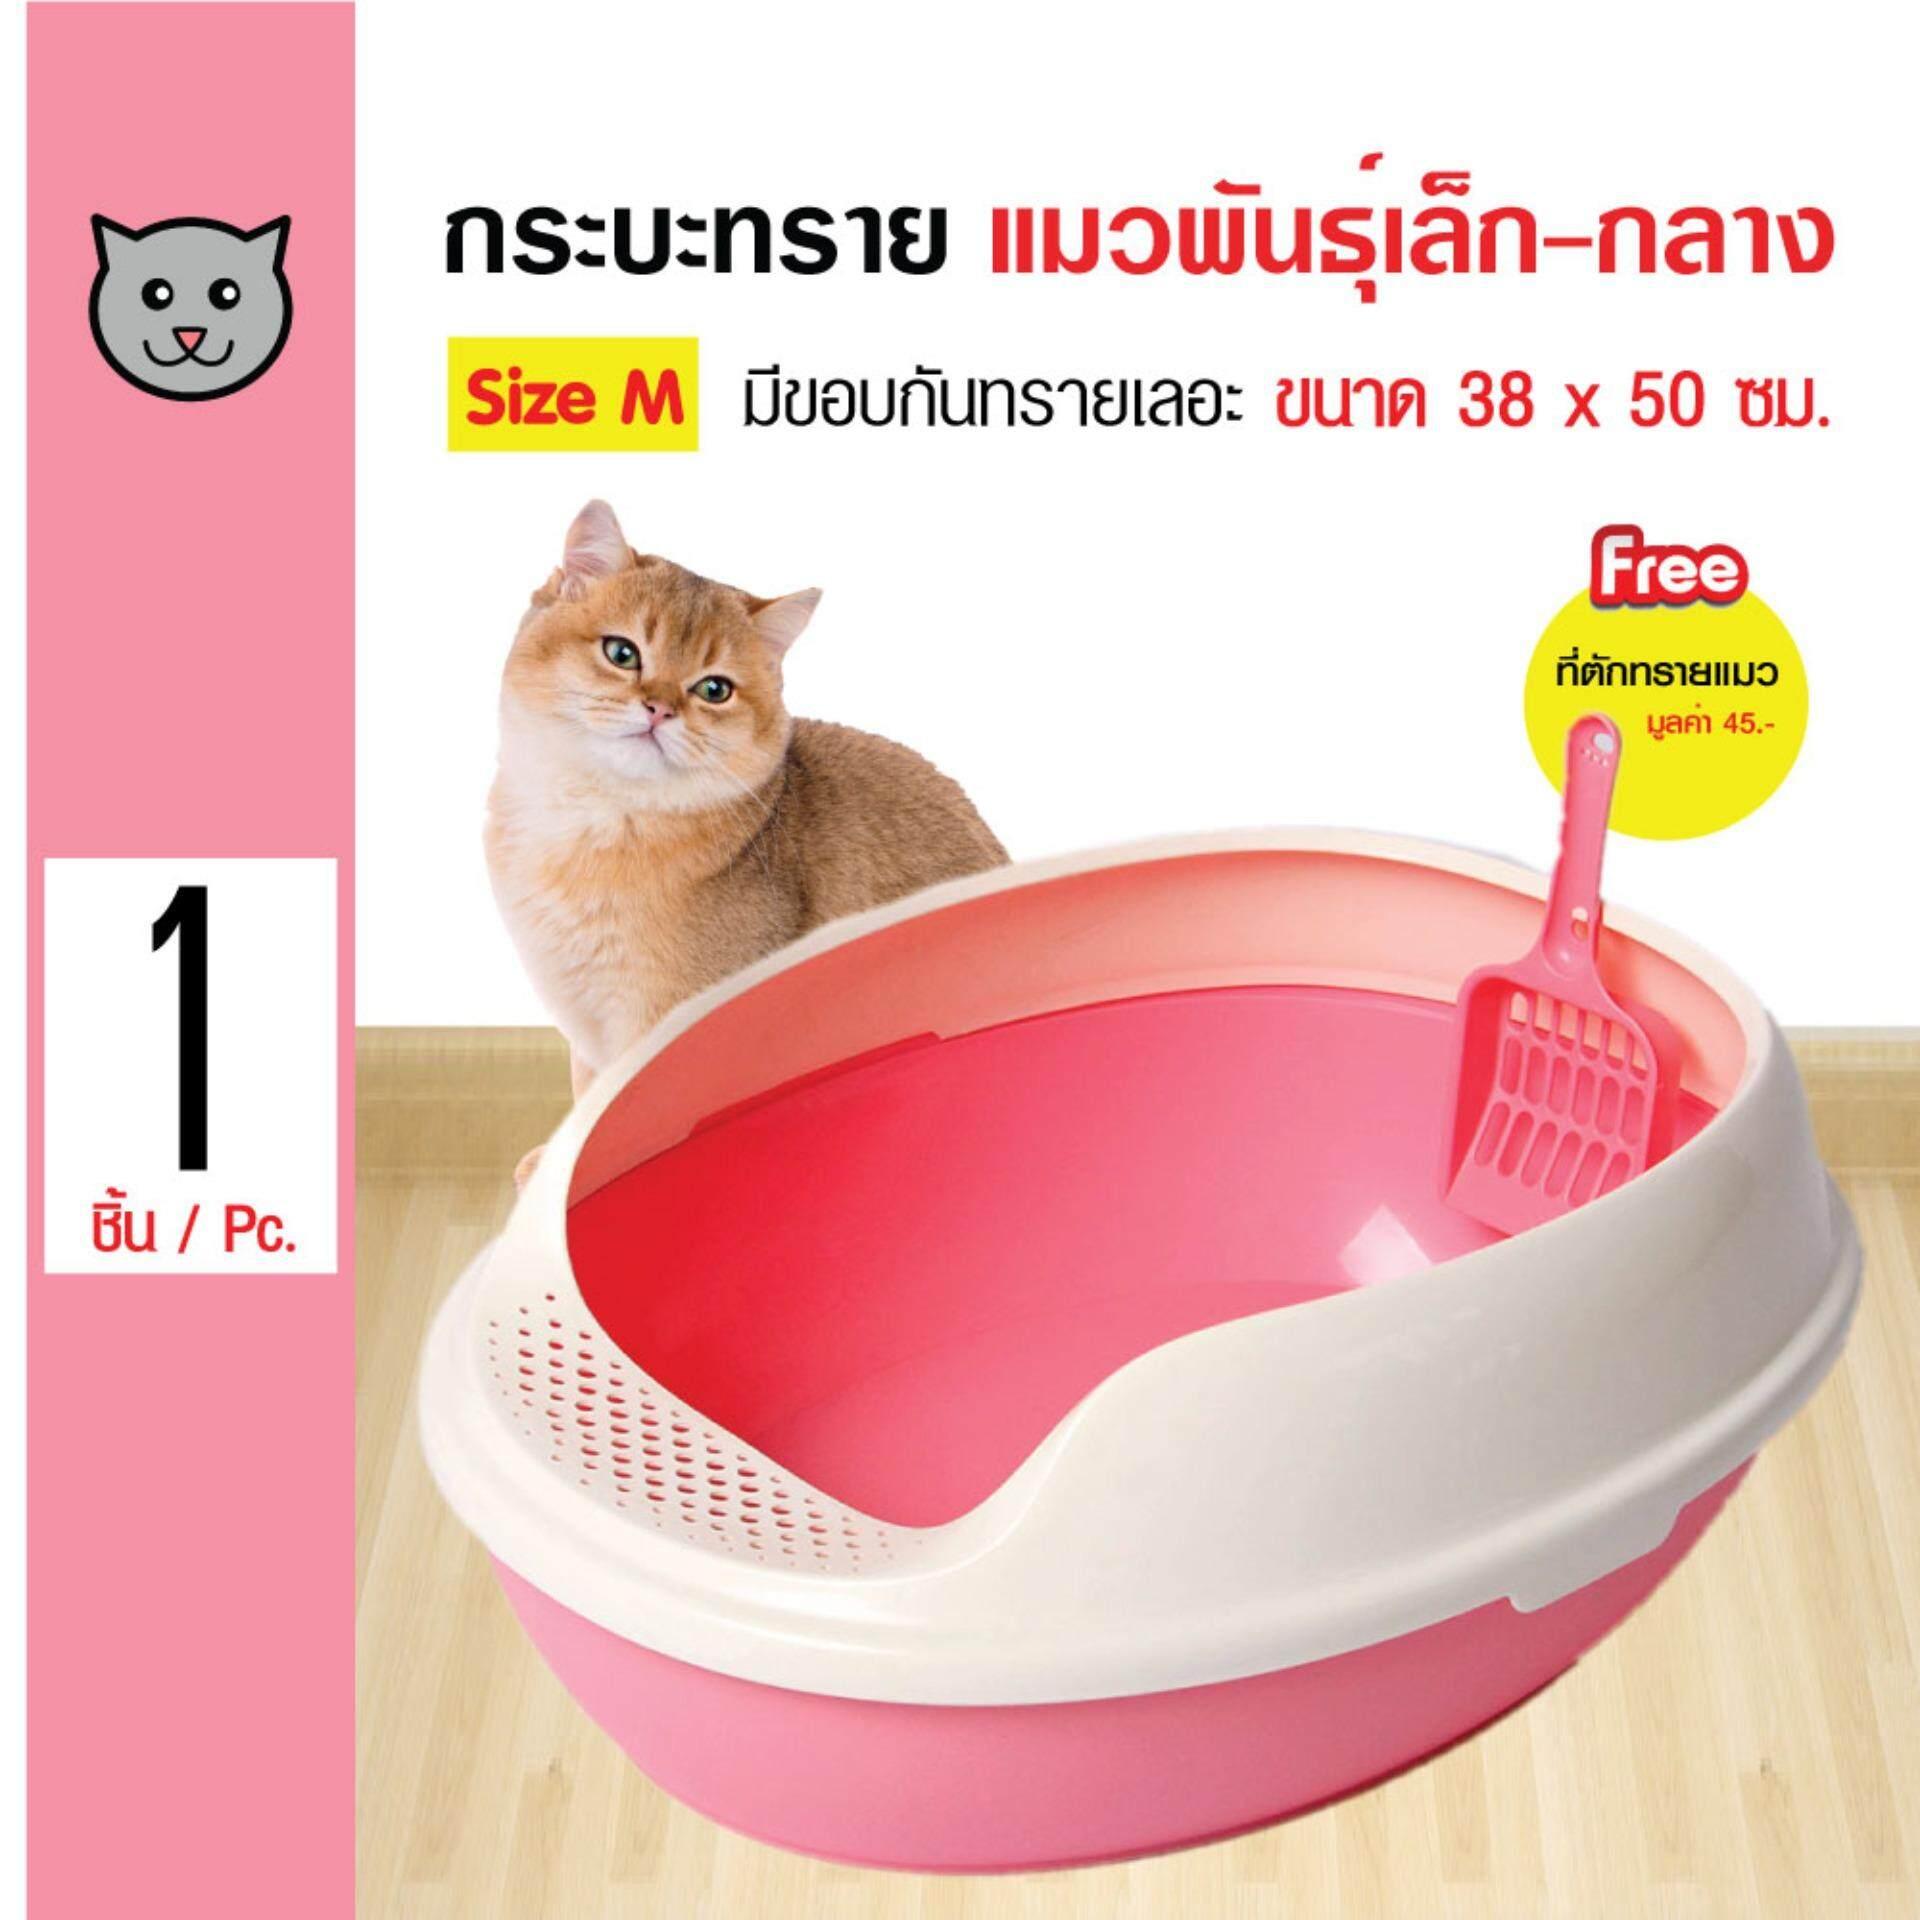 Cat Litter Boxes1397 ค้นพบสินค้าใน กระบะทรายแมวเรียงตาม:ความเป็นที่นิยมจำนวนคนดู: